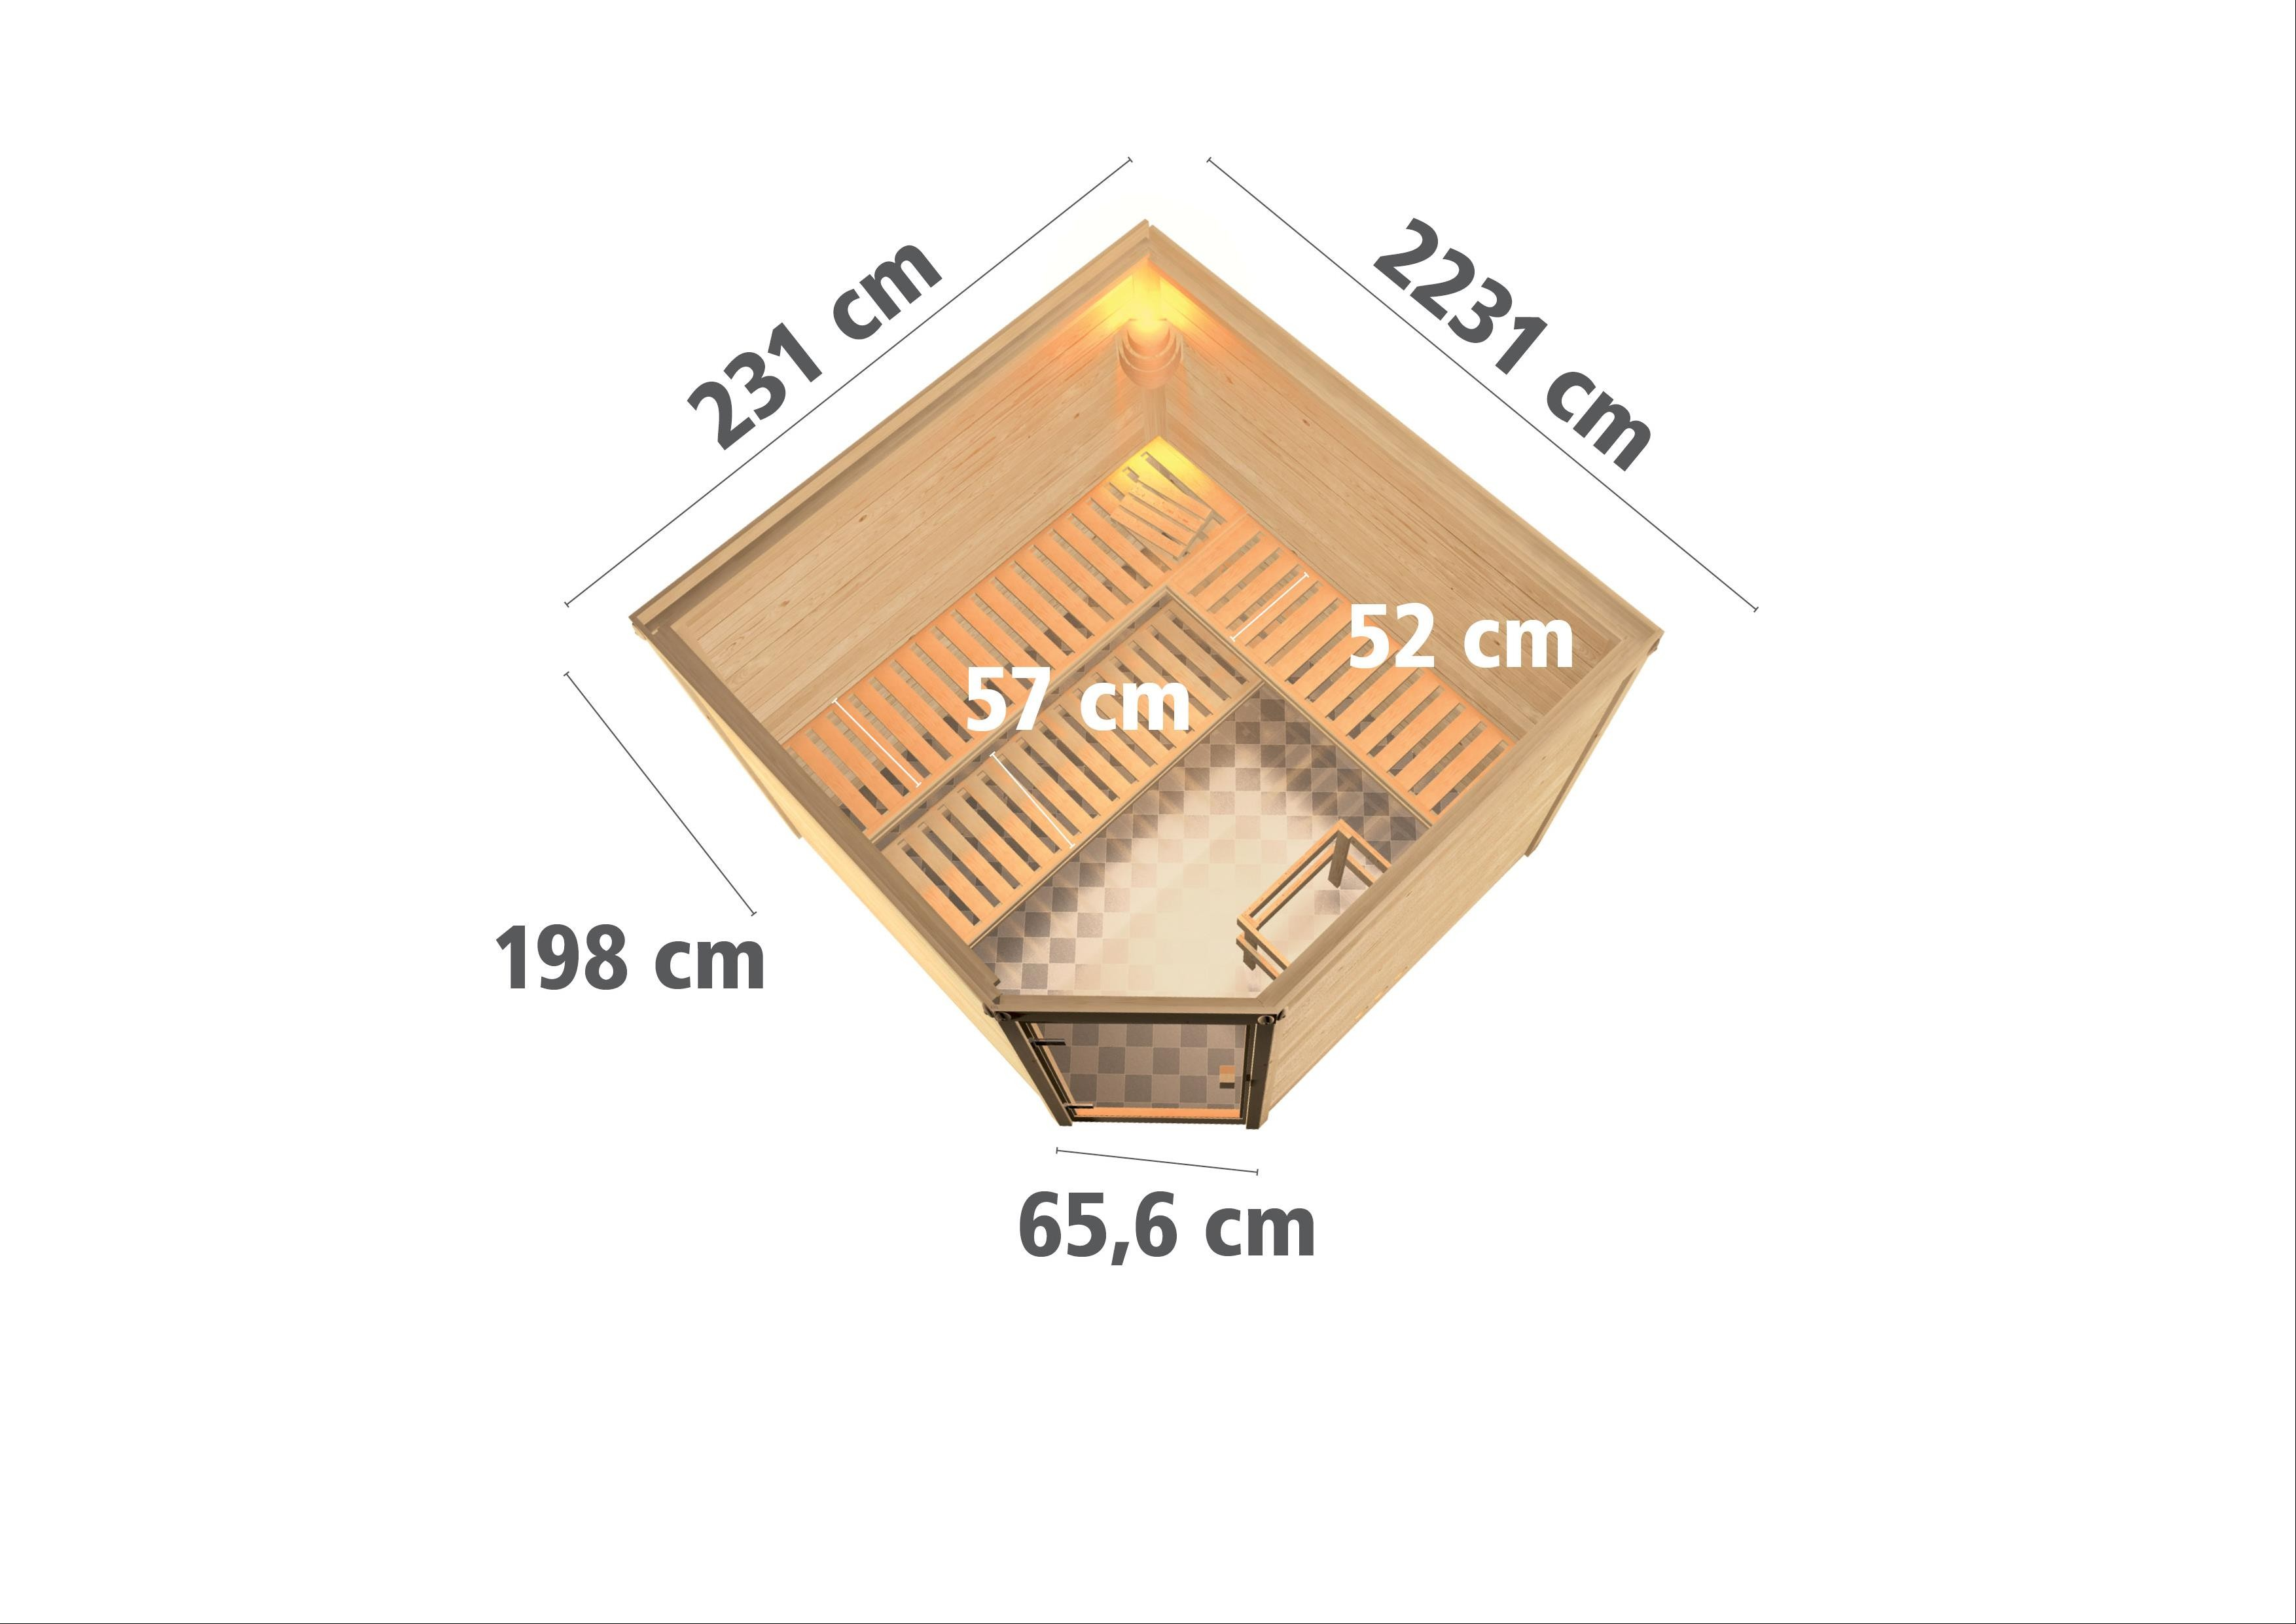 Woodfeeling Sauna Leona 38mm Ofen 9kW extern Tür Holz Bild 3